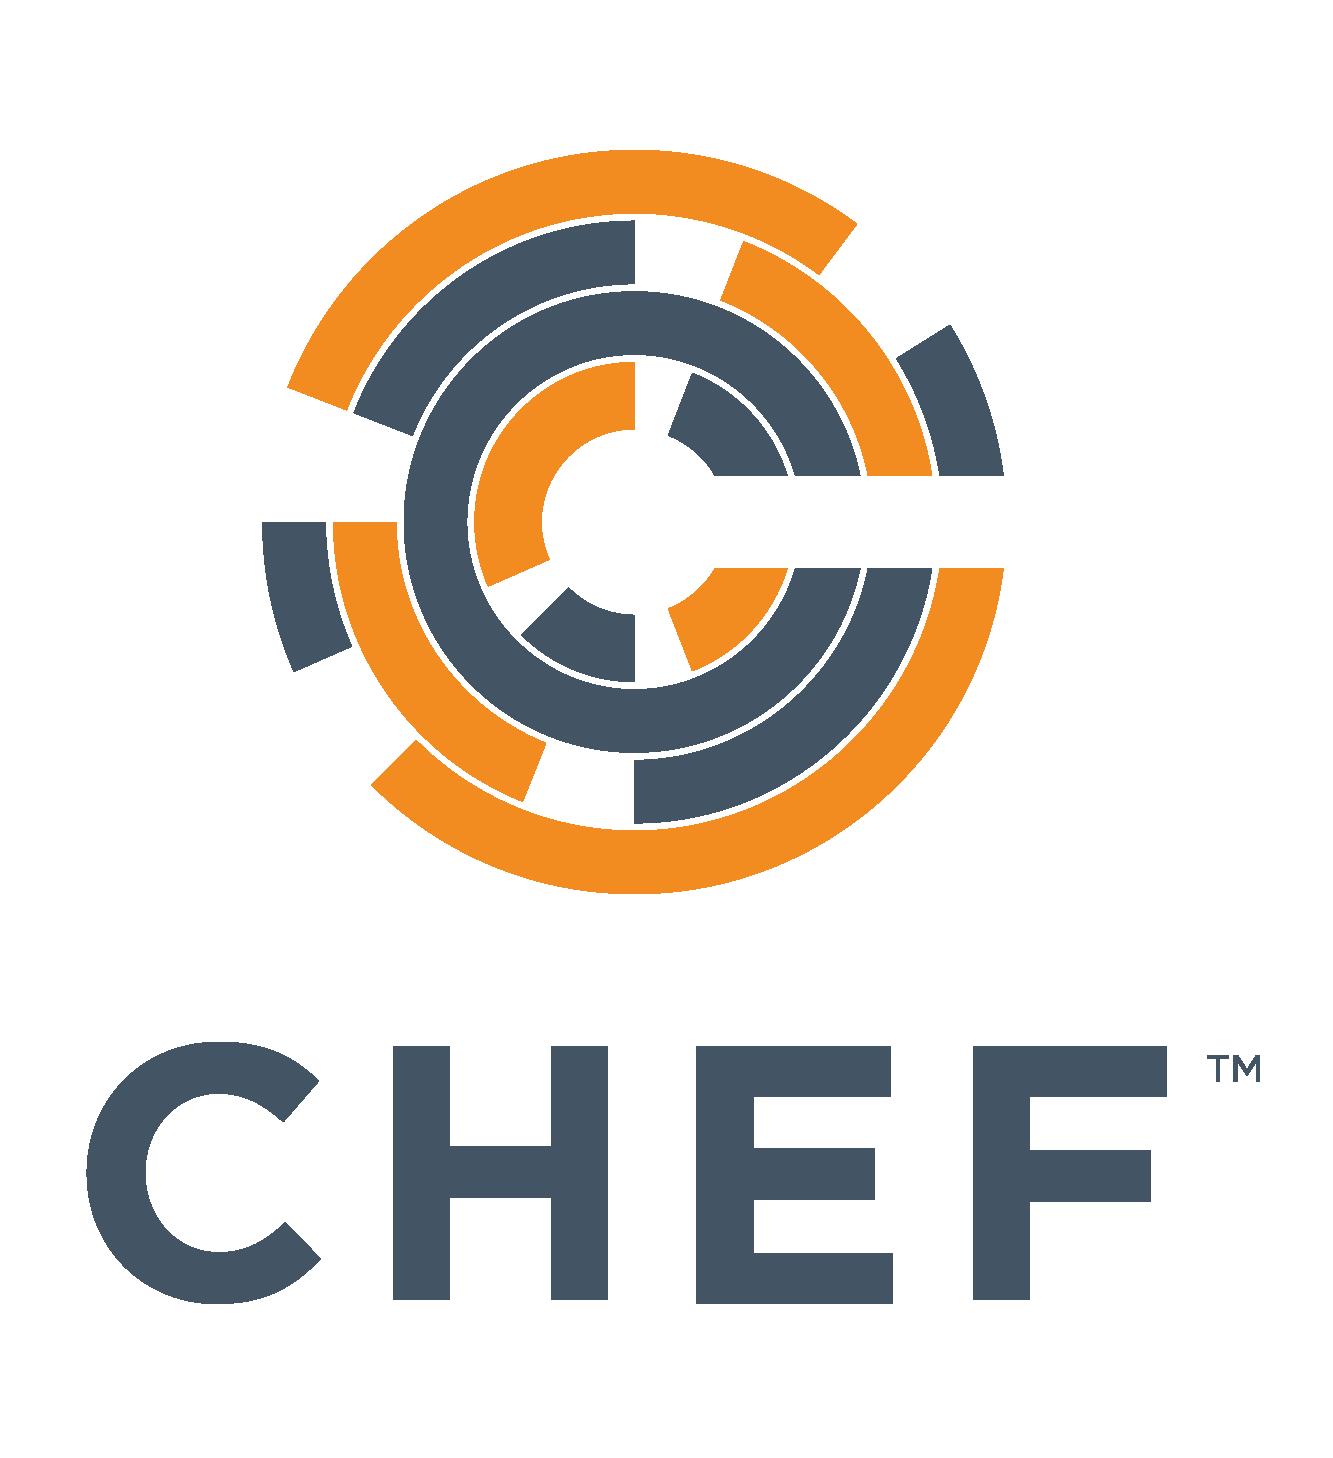 Chef_Software_Inc._company_logo